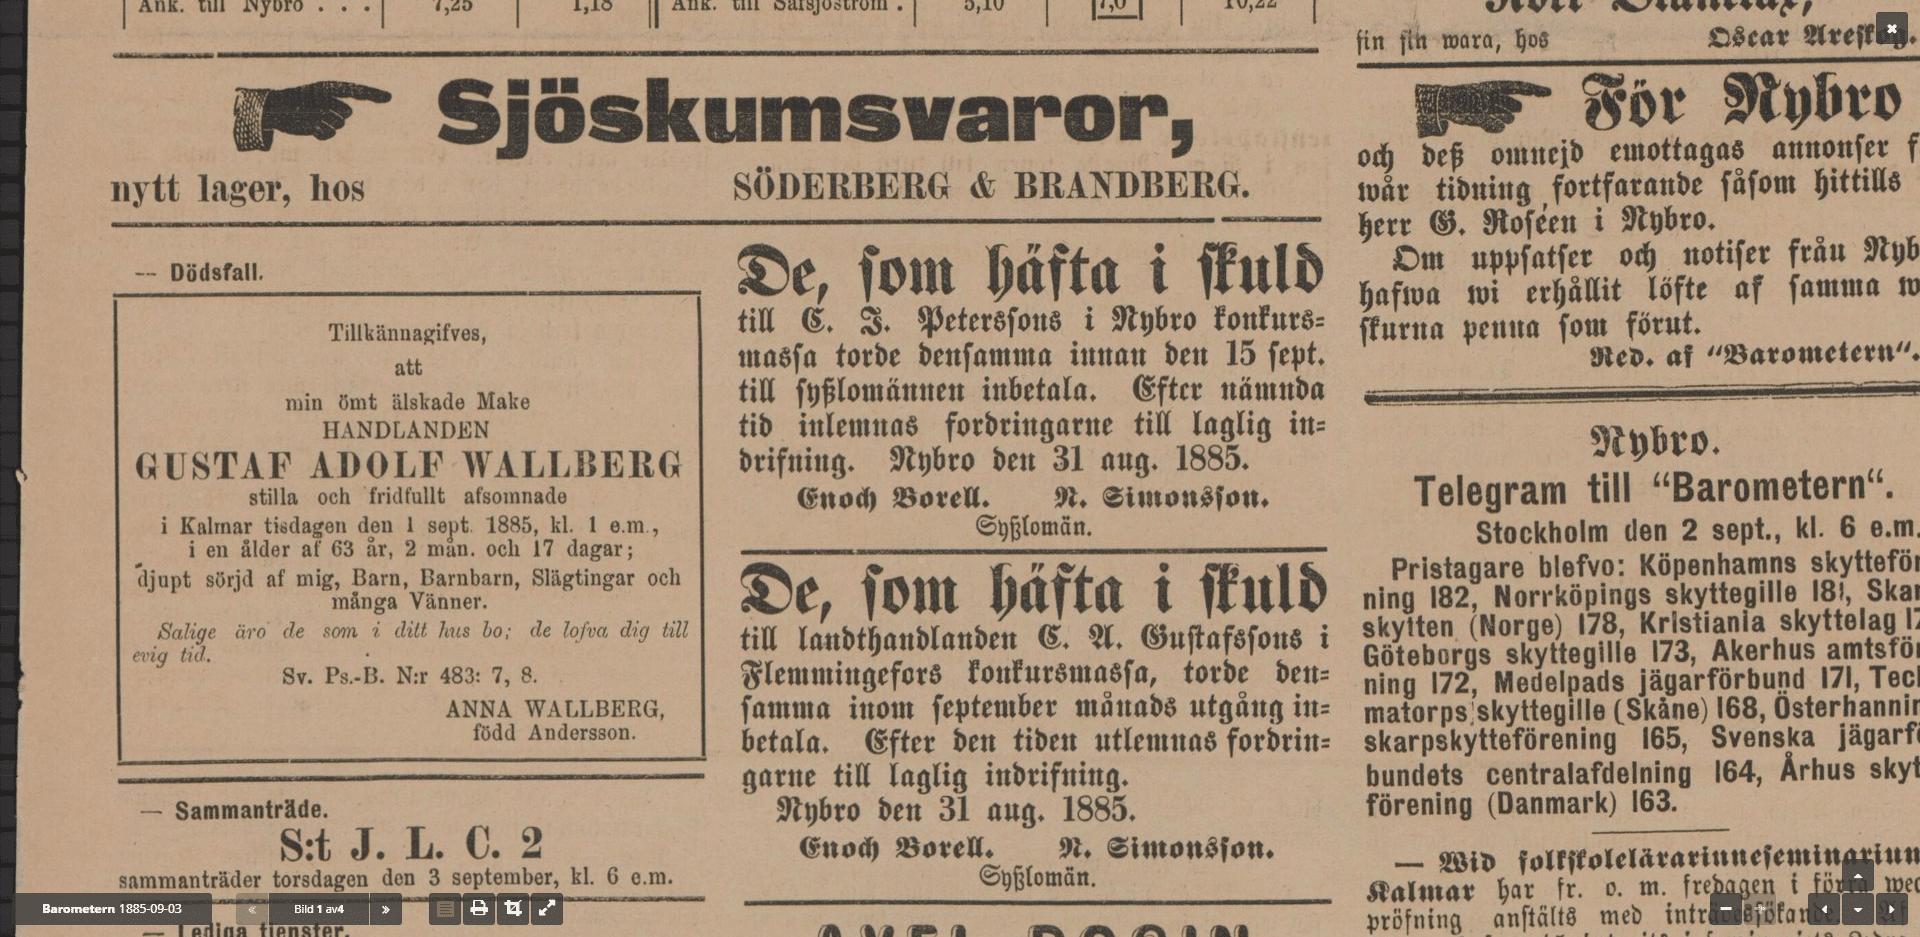 Swedish Genealogy by popular US online genealogists, Price Genealogy: image of a Swedish newspaper clipping.